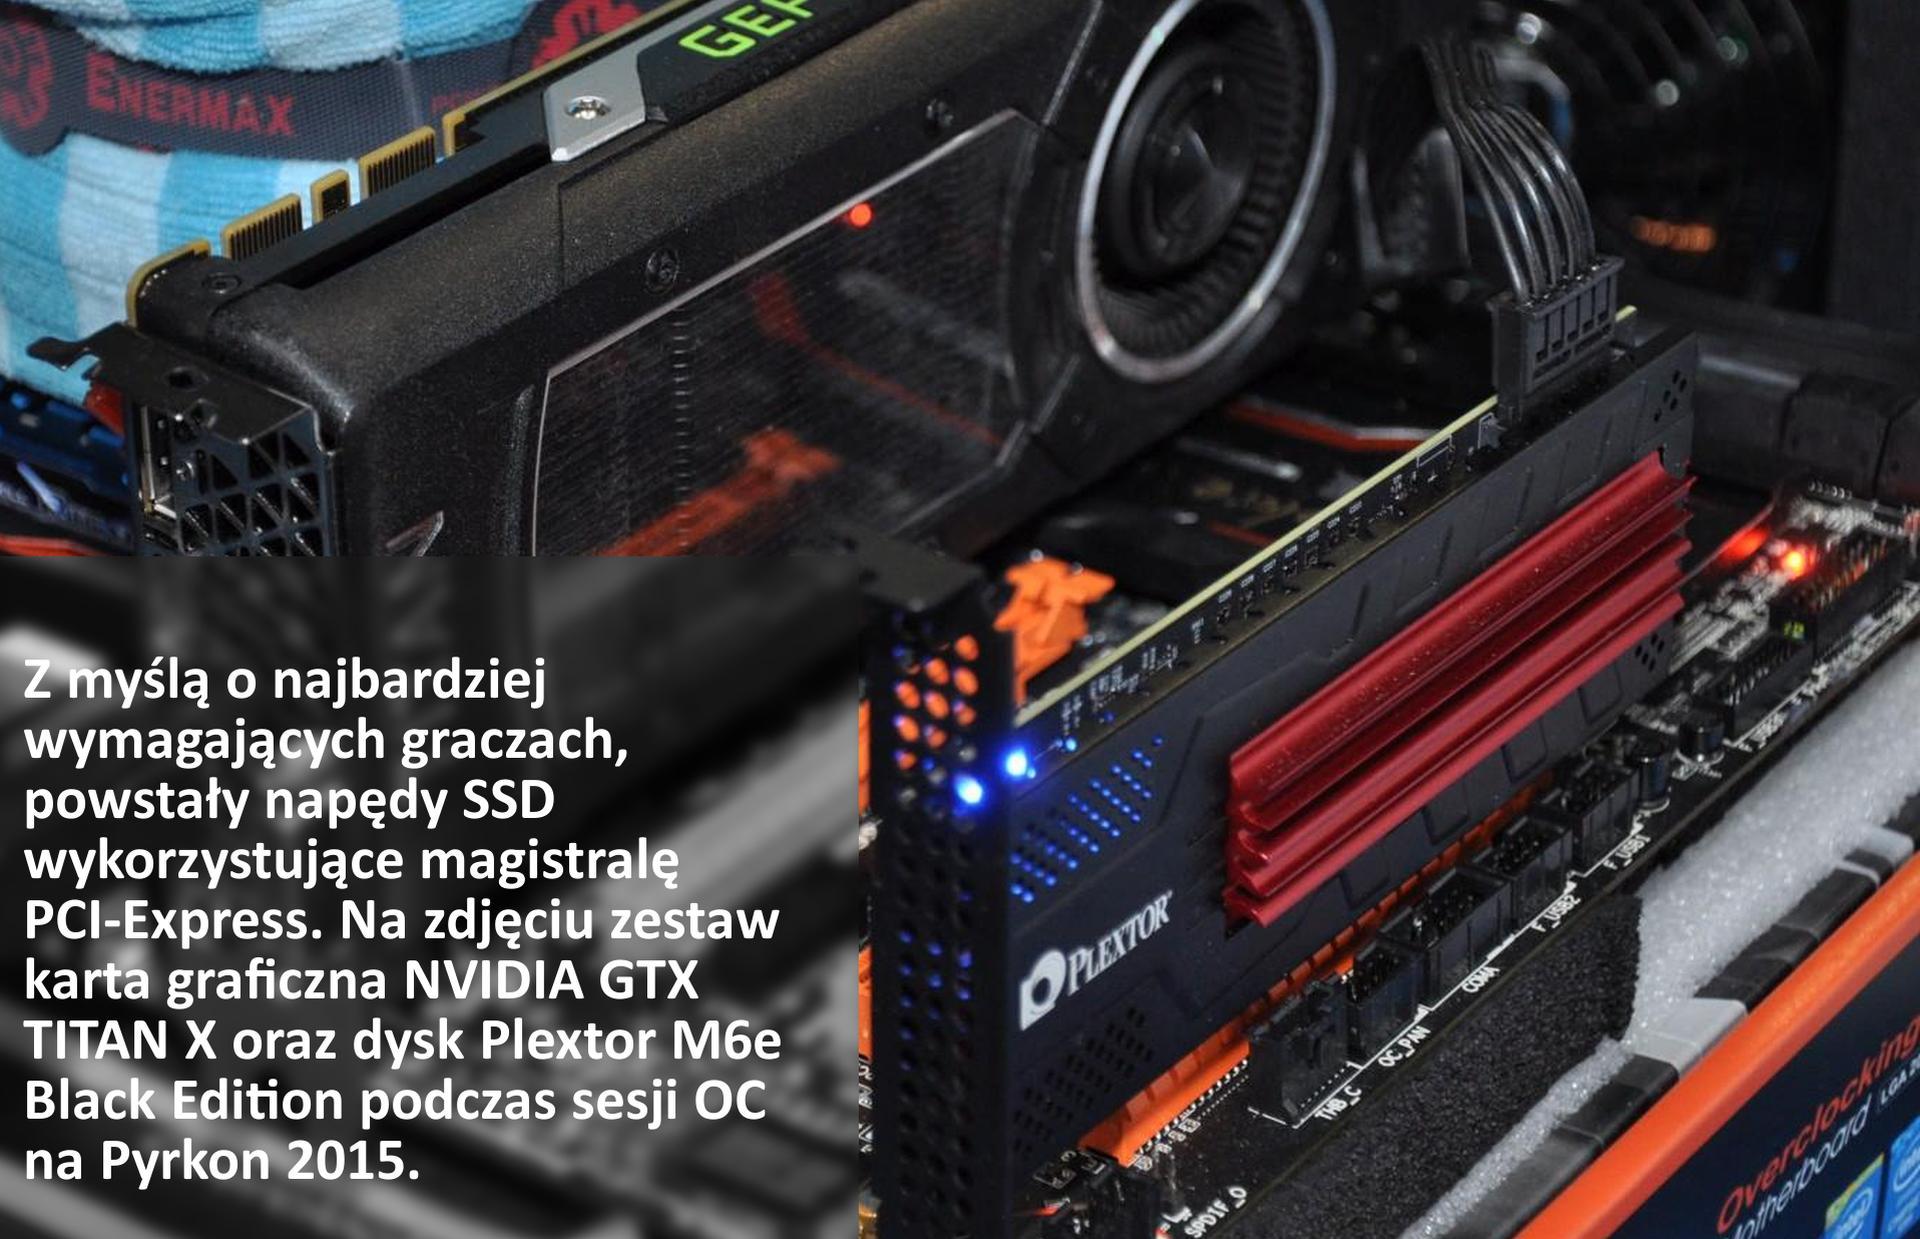 002_Dysk_SSD_w grach_Plextor_M6e_BK